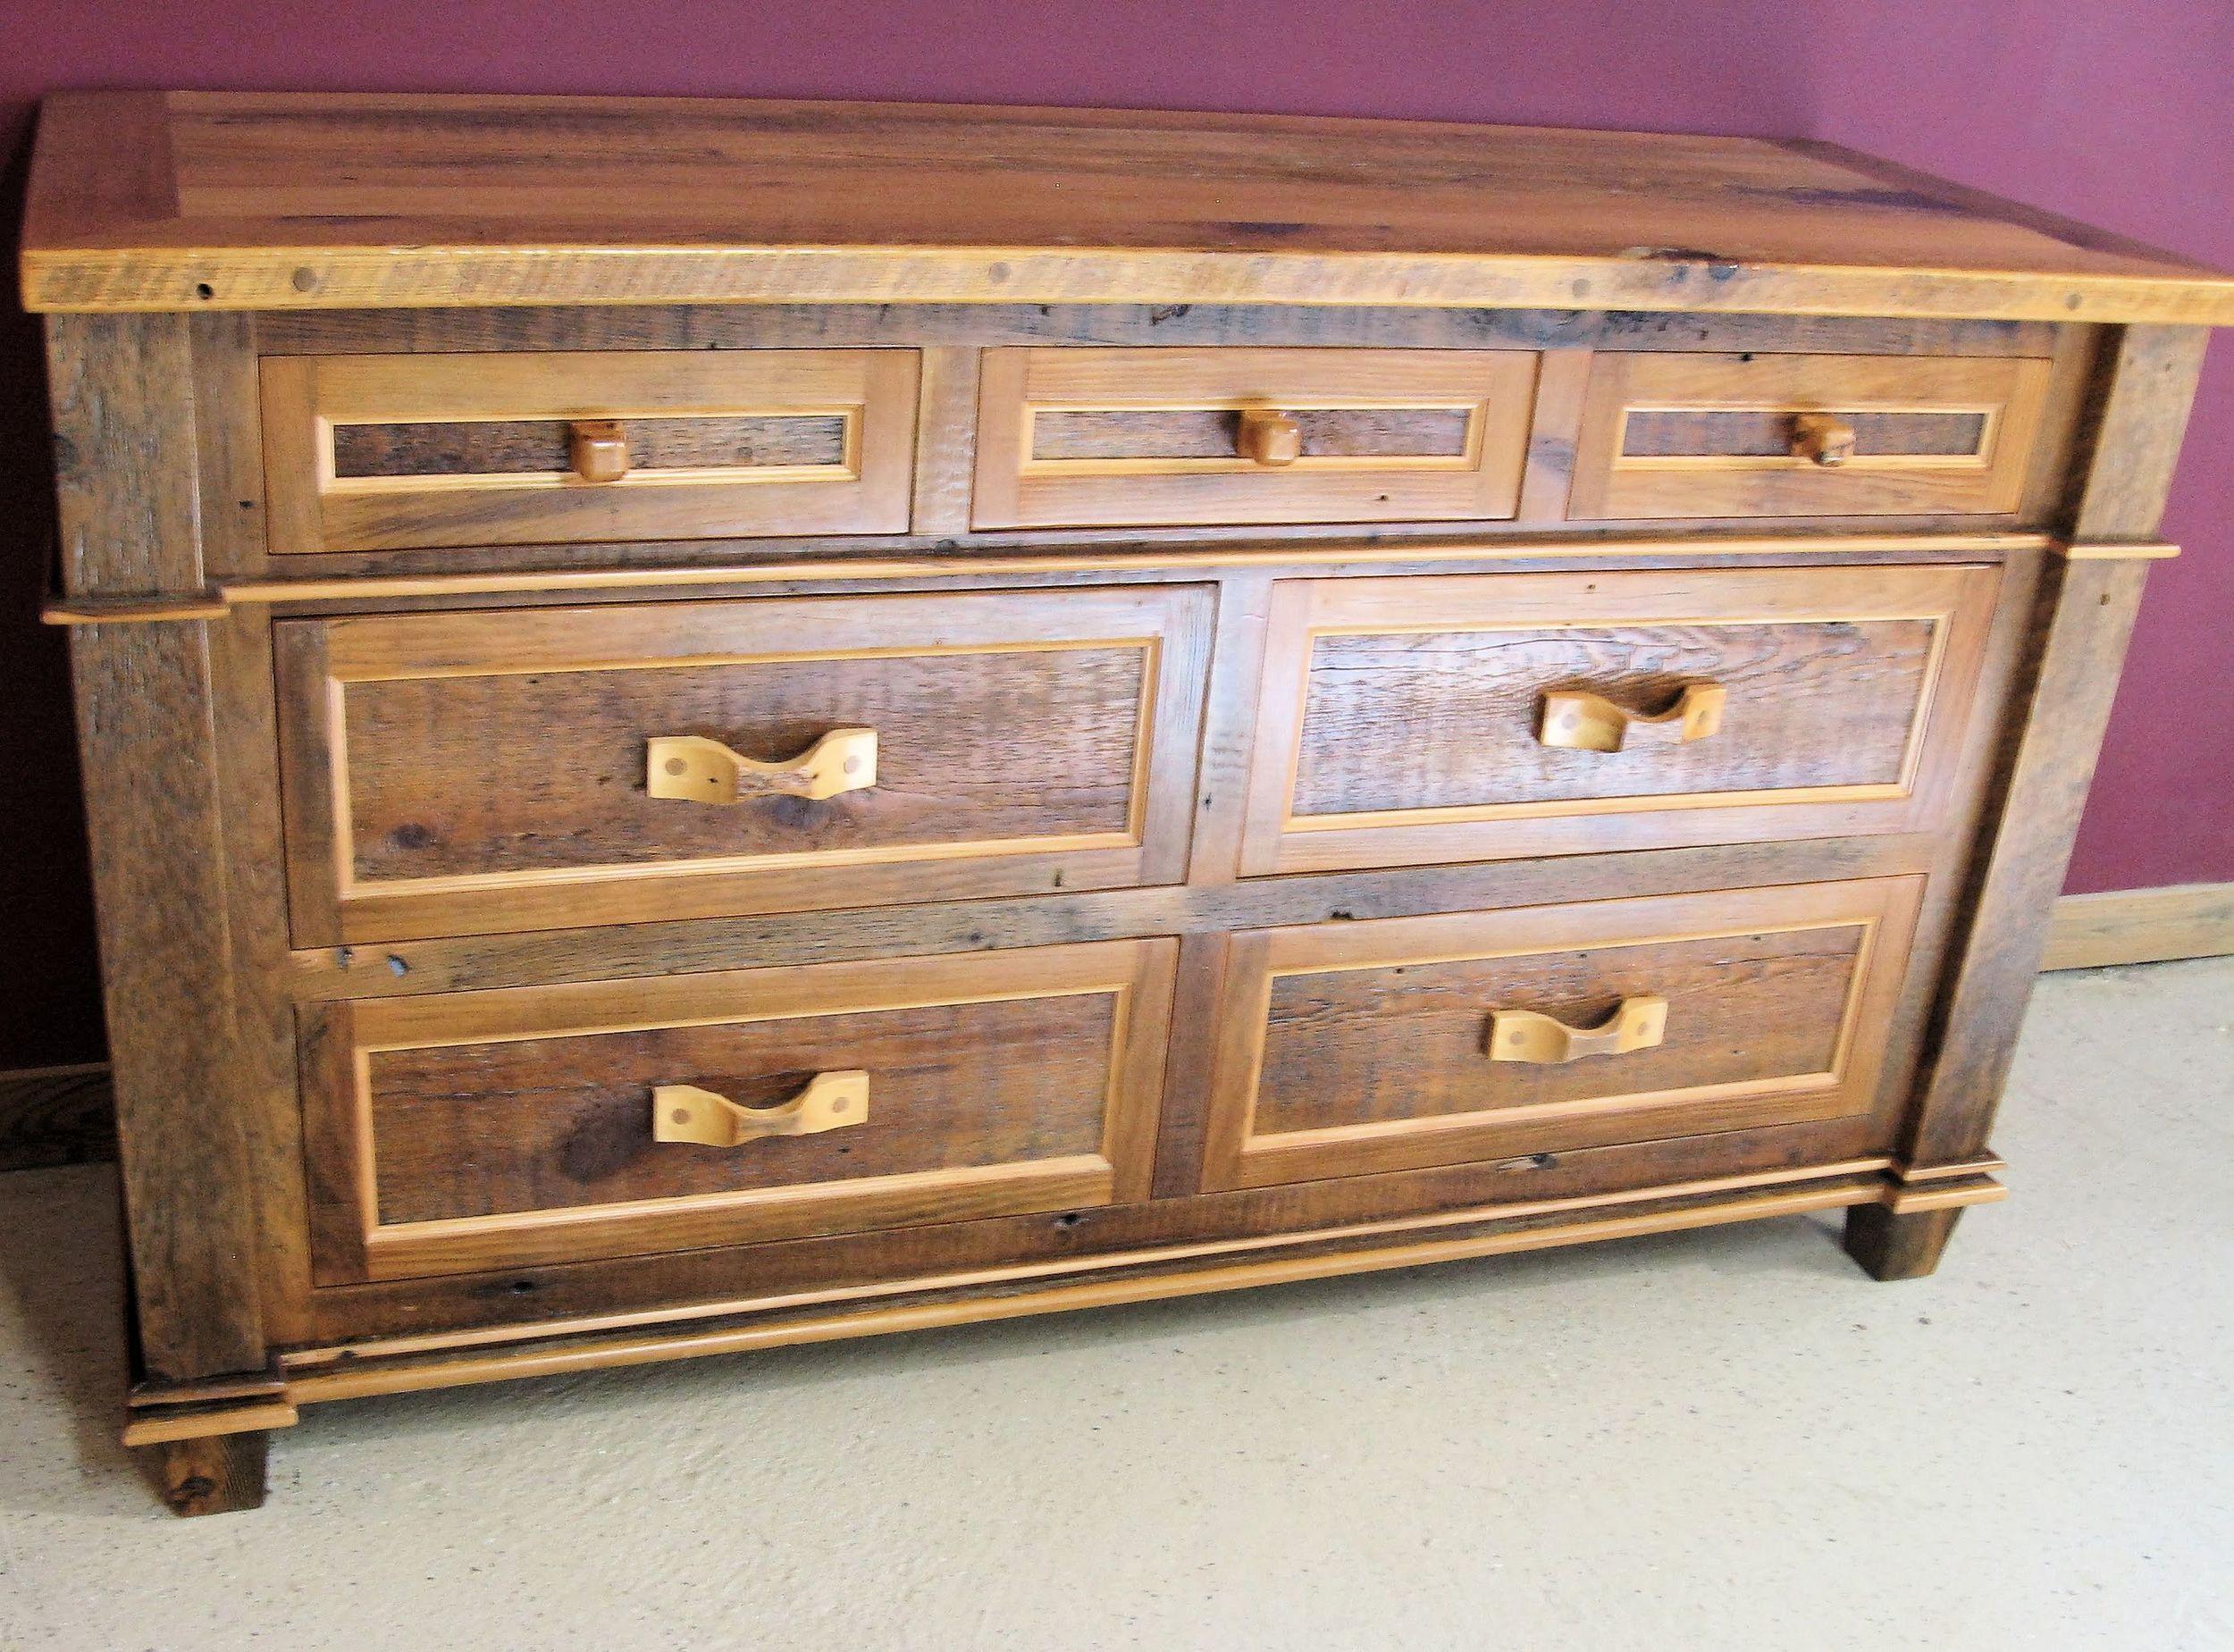 Antique Dressers 007.jpg